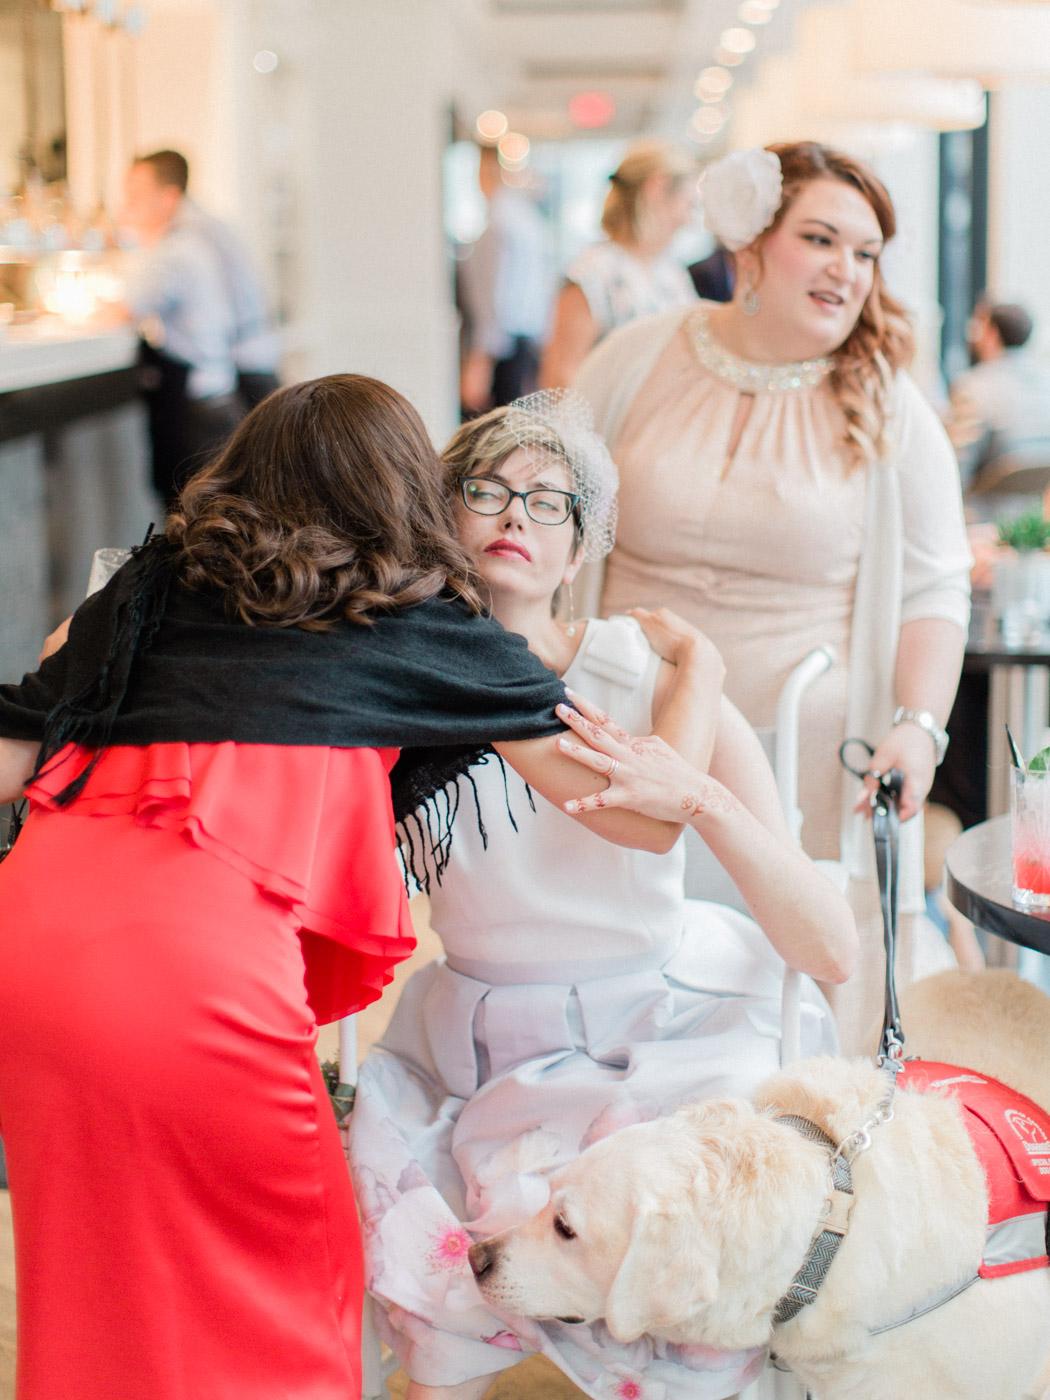 Toronto-wedding-photographer-intimate-restaurant-elopement-chase-oyster-downtown47.jpg